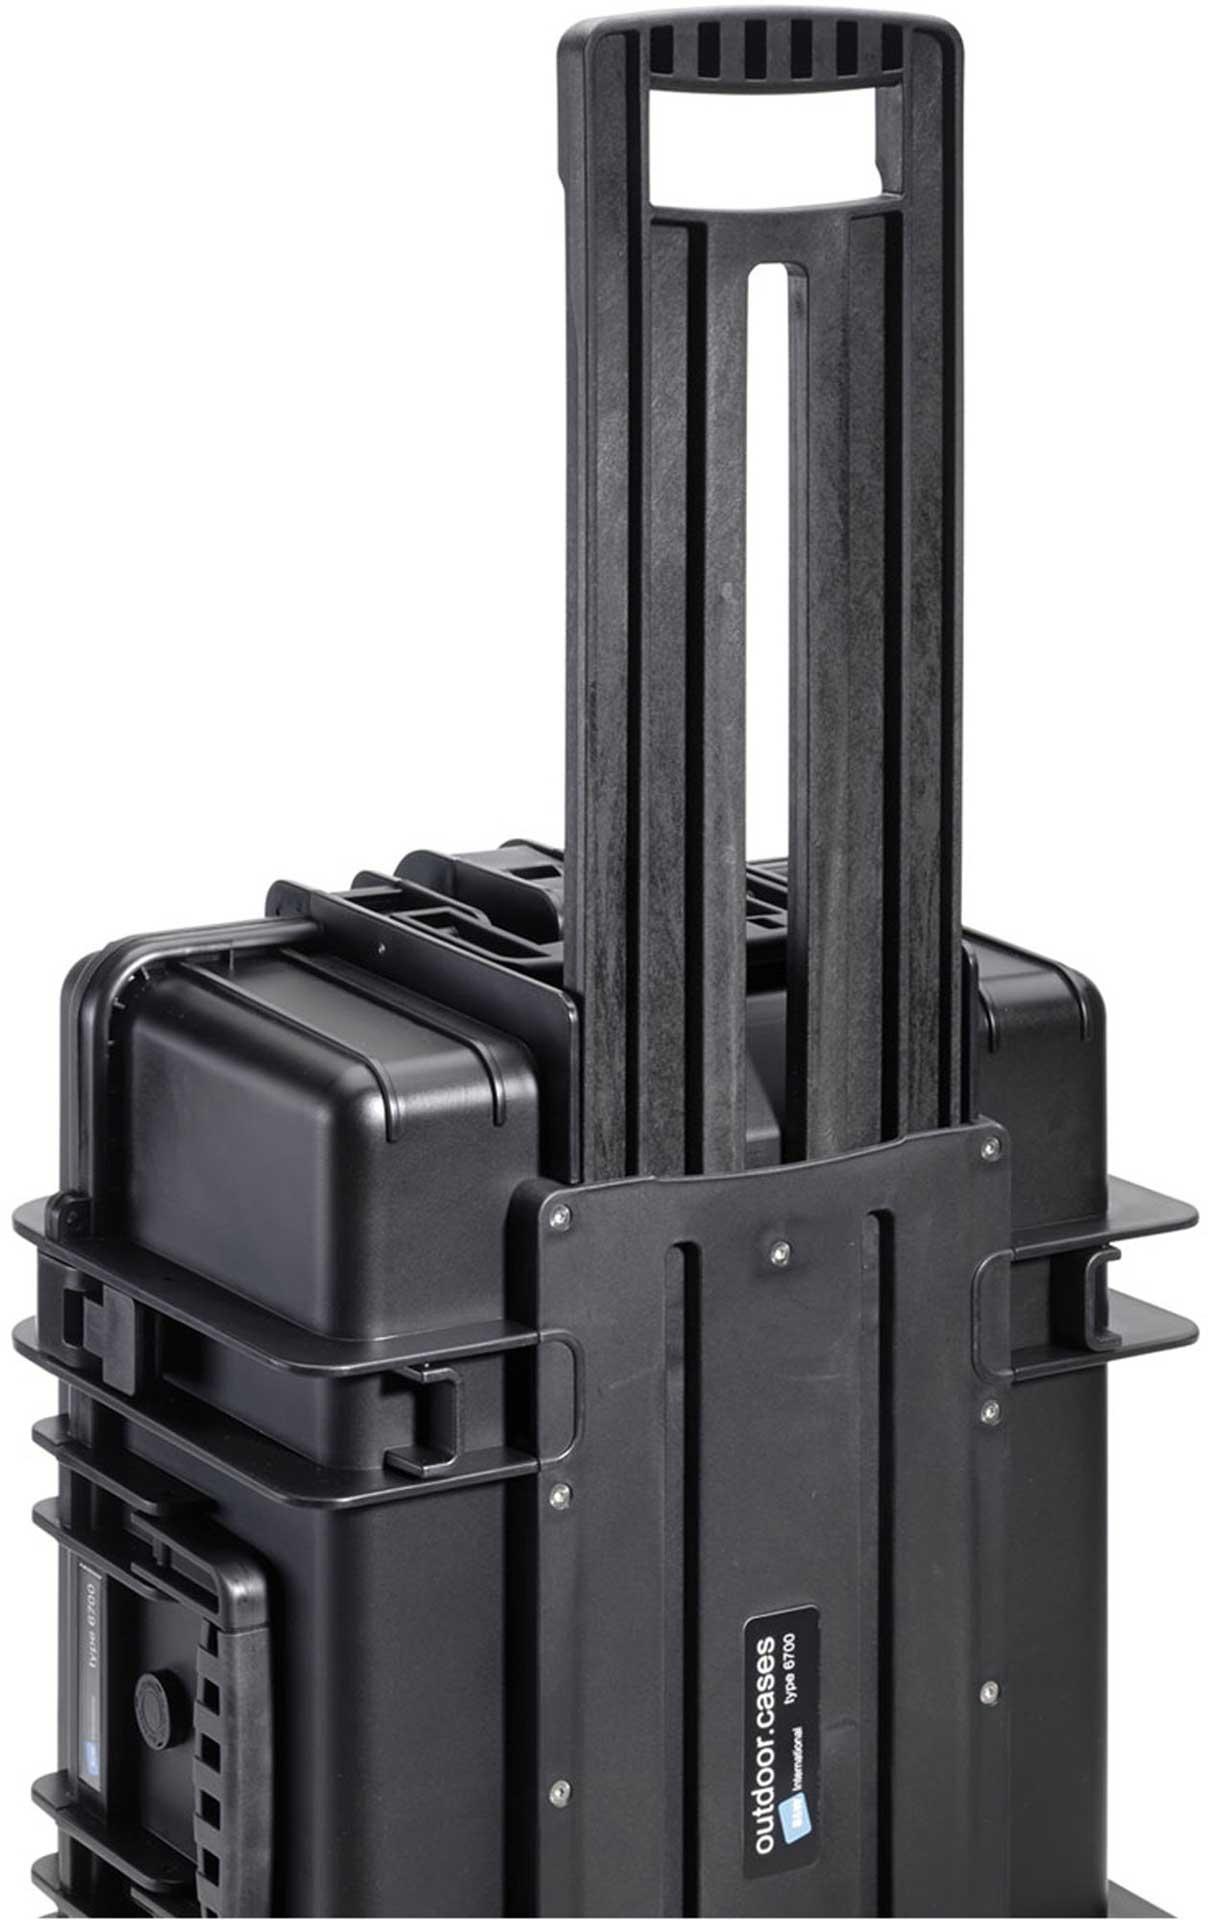 B&W INTERNATIONAL COPTER CASE PRO TROLLEY  PHANTOM 3 DROHNEN TRANSPORTKOFFER WASSERDICHT OUTDOOR CASE 6700 BLACK PHANTOM 3 ADVANCED ODER PROFESIONAL